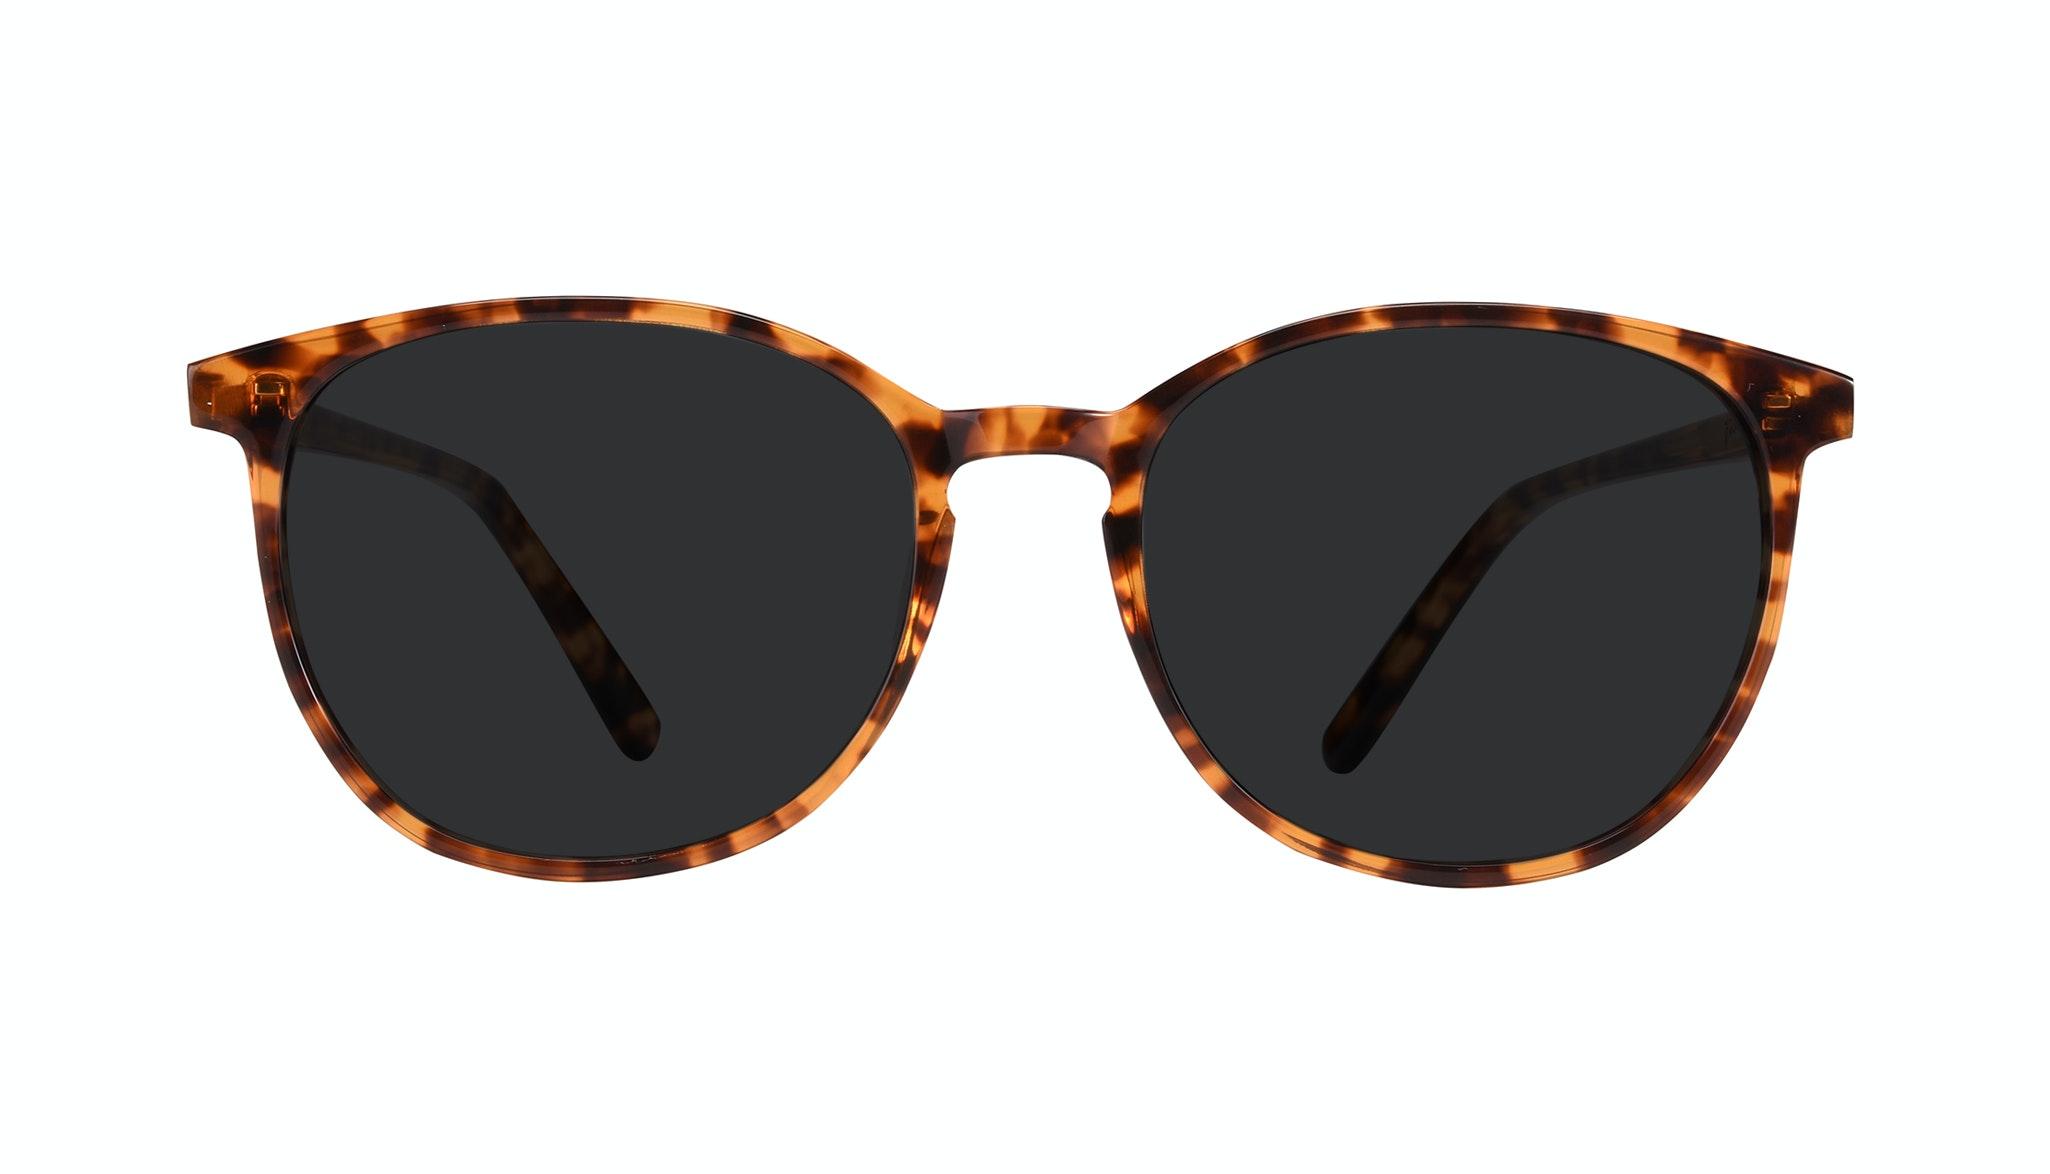 Affordable Fashion Glasses Round Sunglasses Women Femme Libre Josette